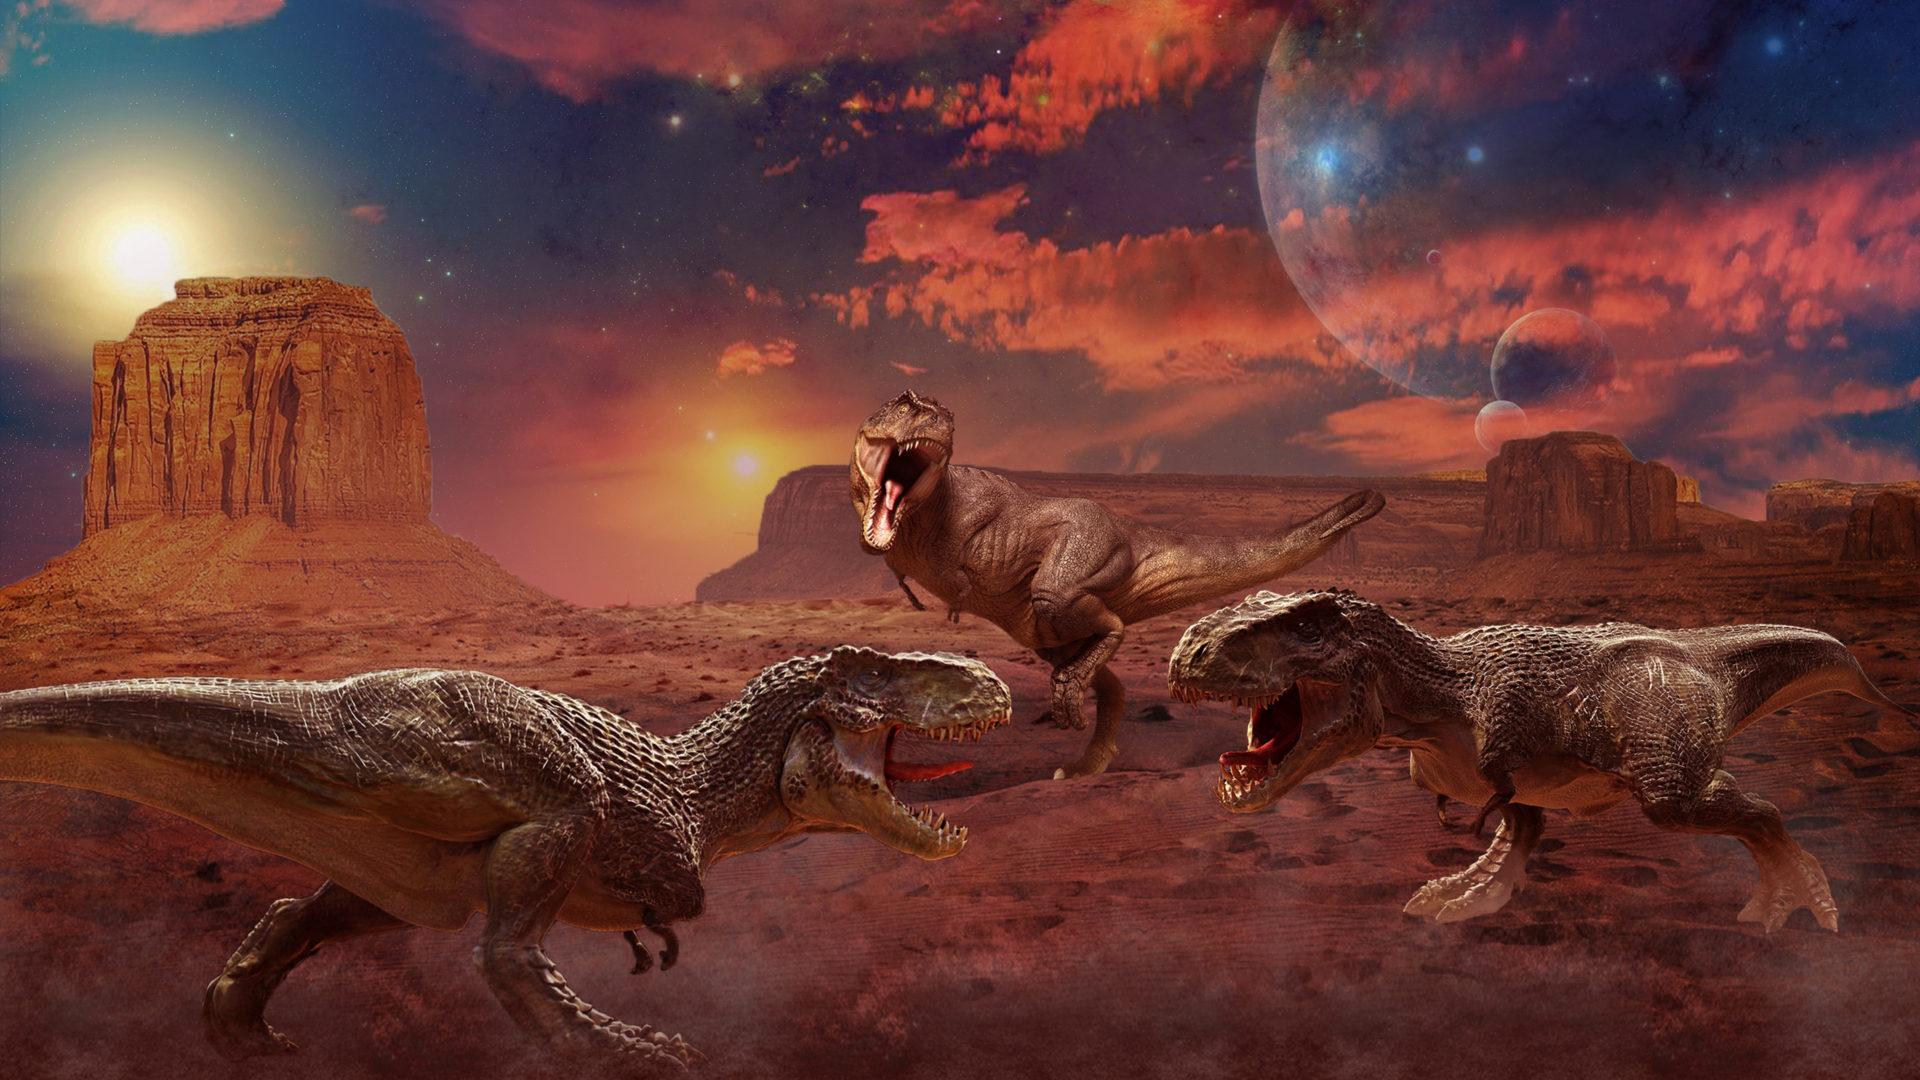 Dragon Wallpaper Cute Ancient Animals Dinosaurs Painting Art Three 3 Animals Hd